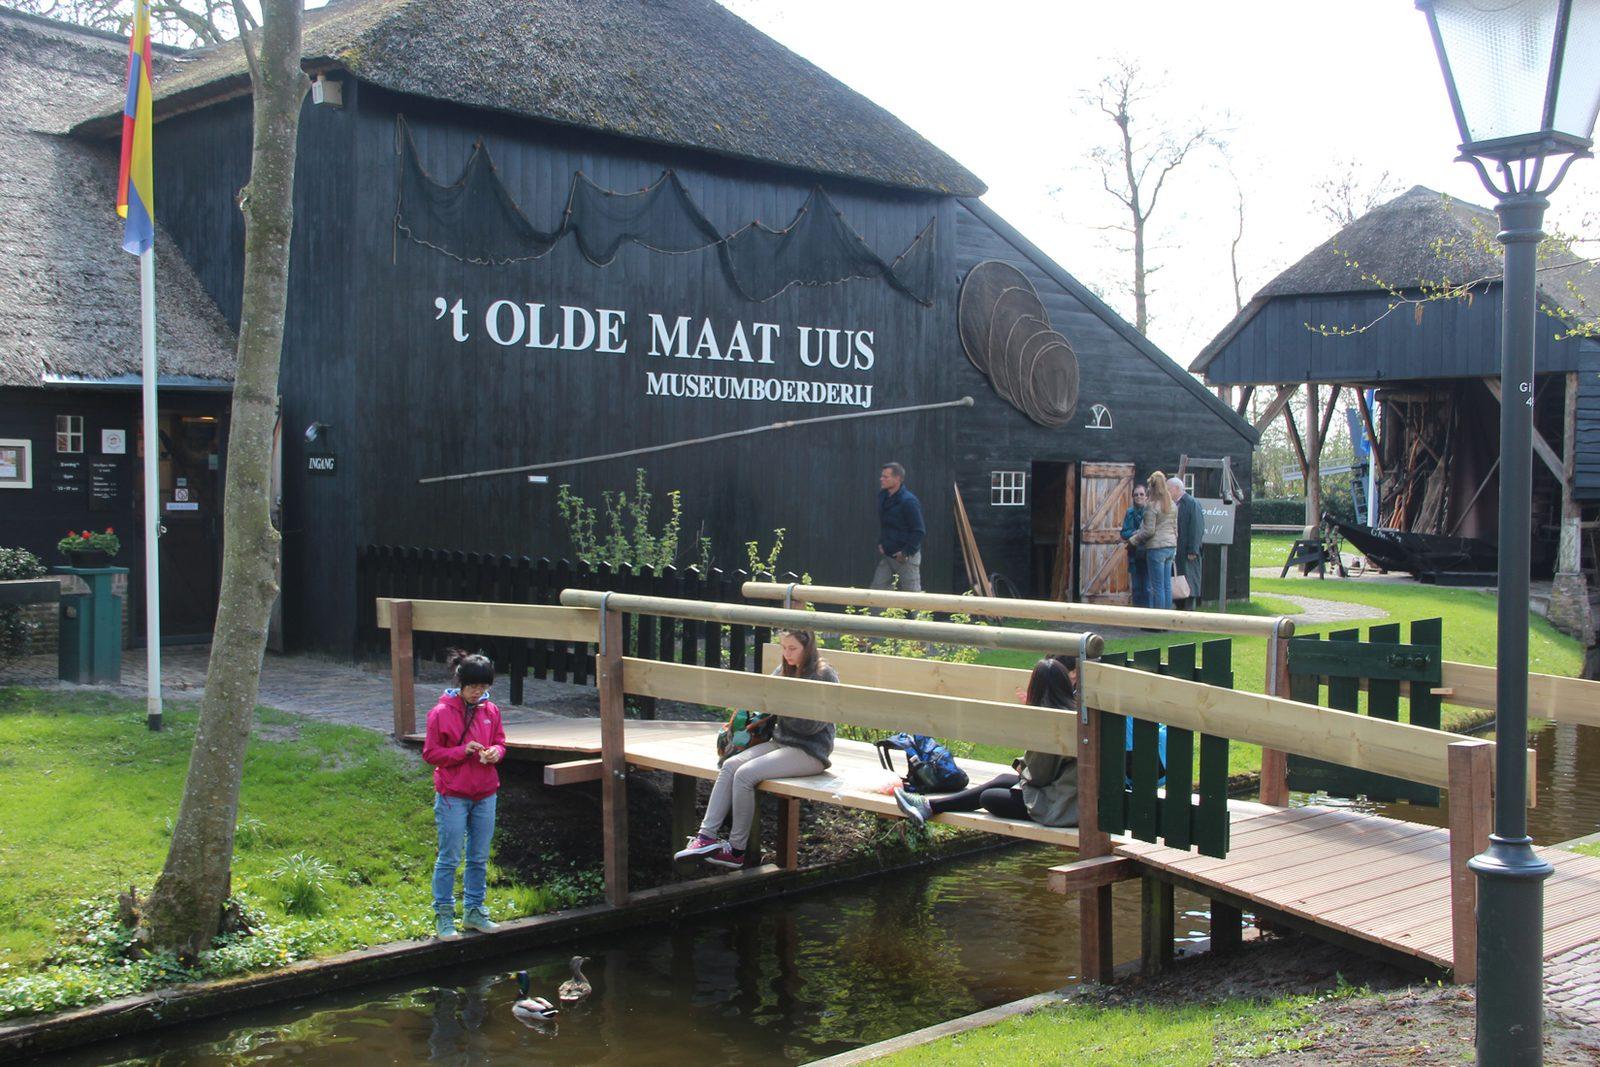 Museum-farm 't Olde Maat Uus DoenvtrbMuseum